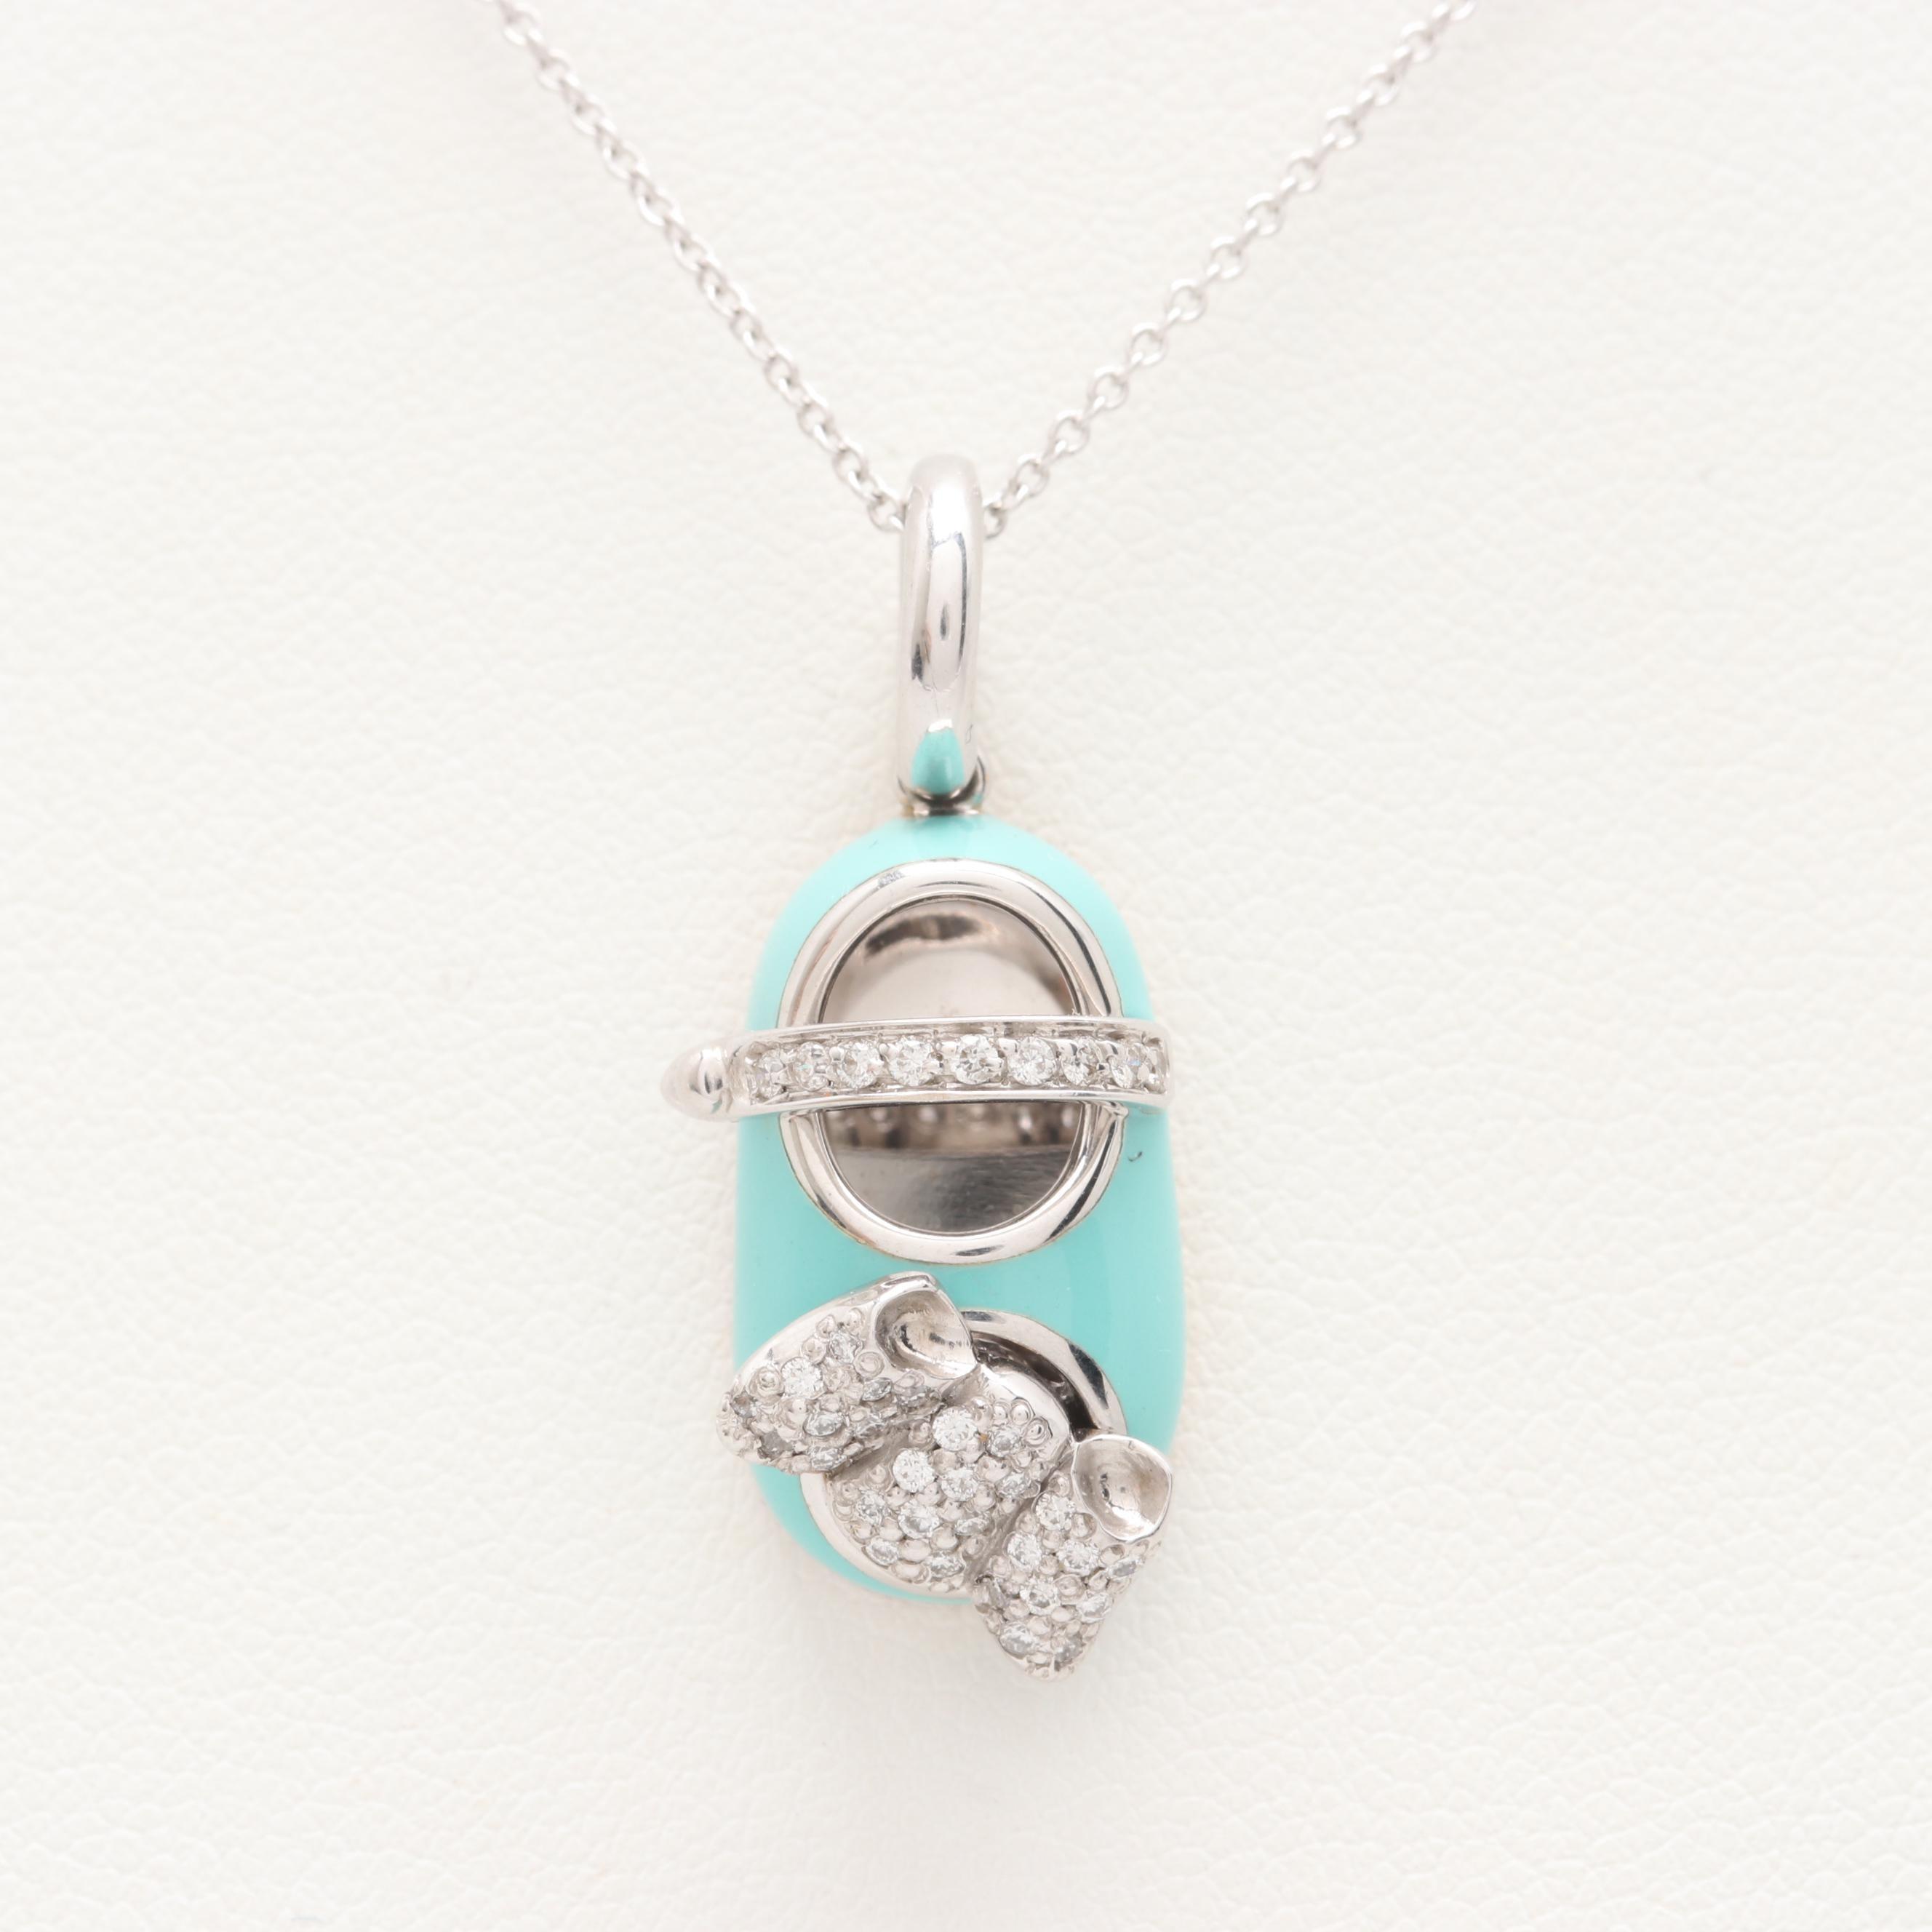 Aaron Basha 18K White Gold Diamond Pendant on Herco Chain Necklace